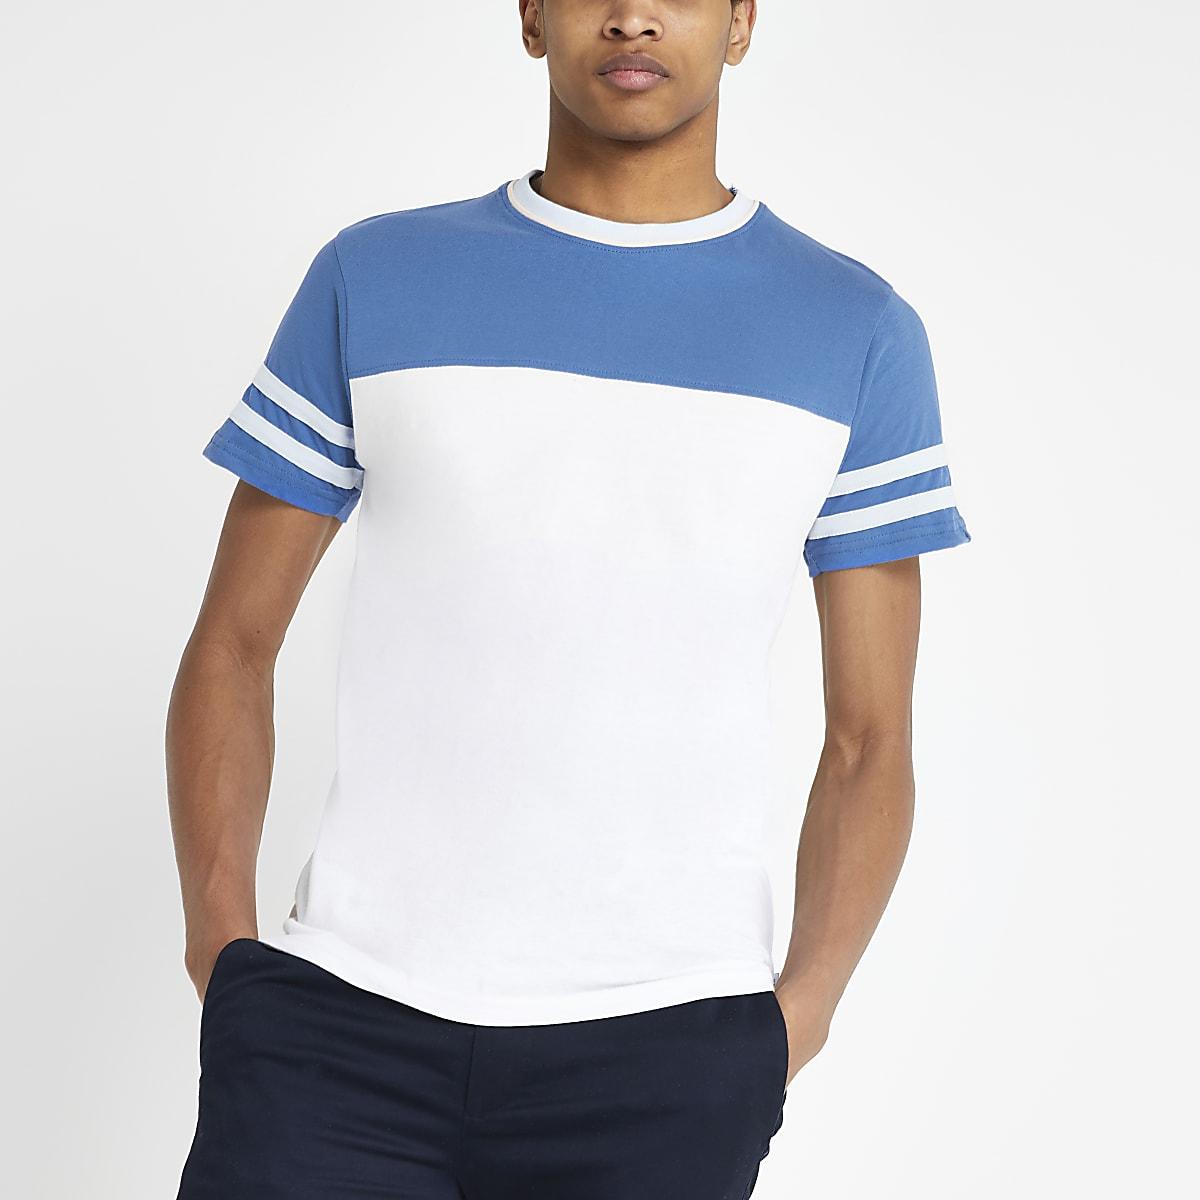 Bellfield – Weißes T-Shirt in Blockfarben